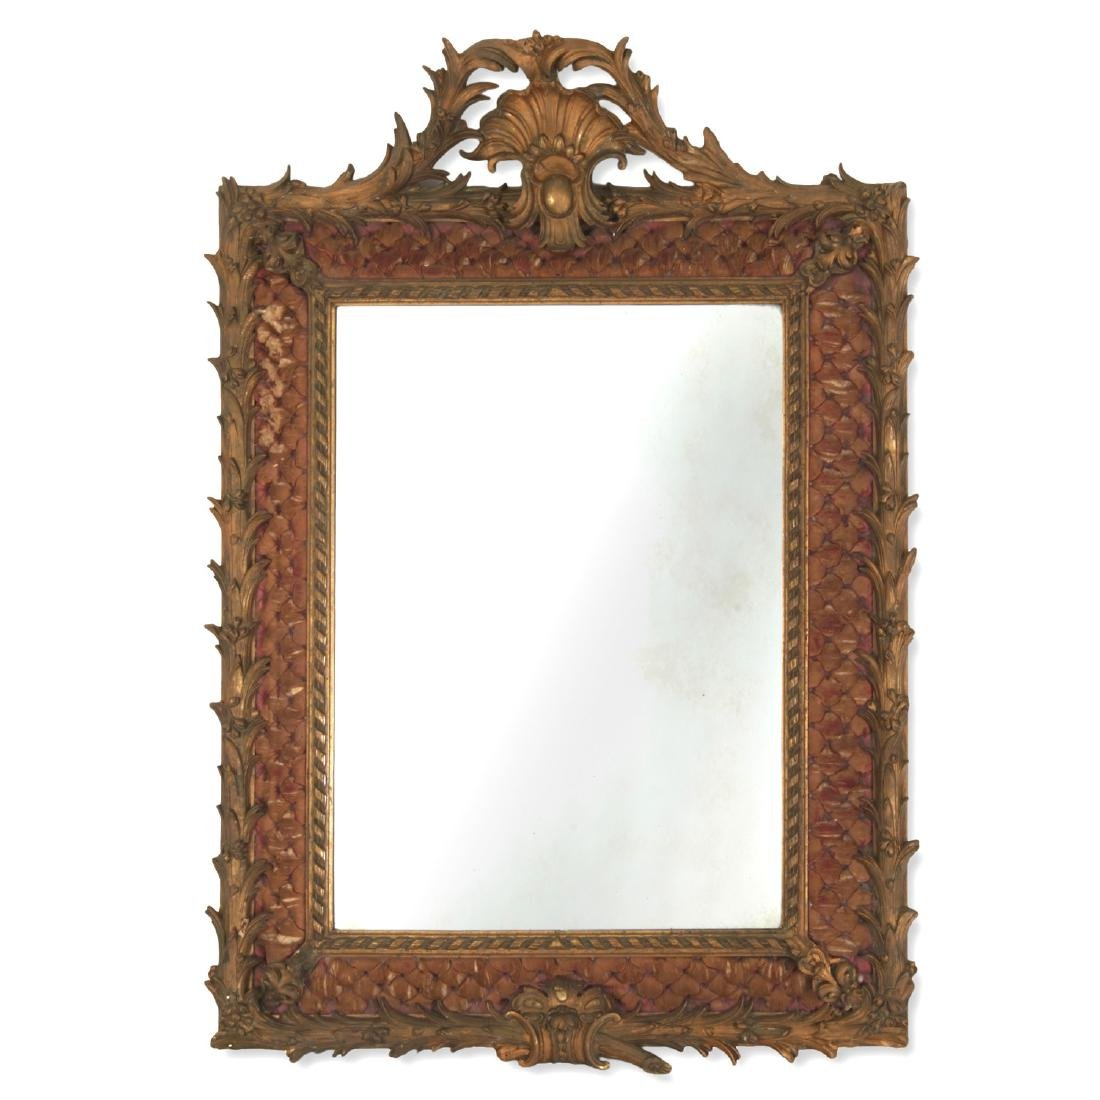 Continental Rococo gilt and tufted silk mirror